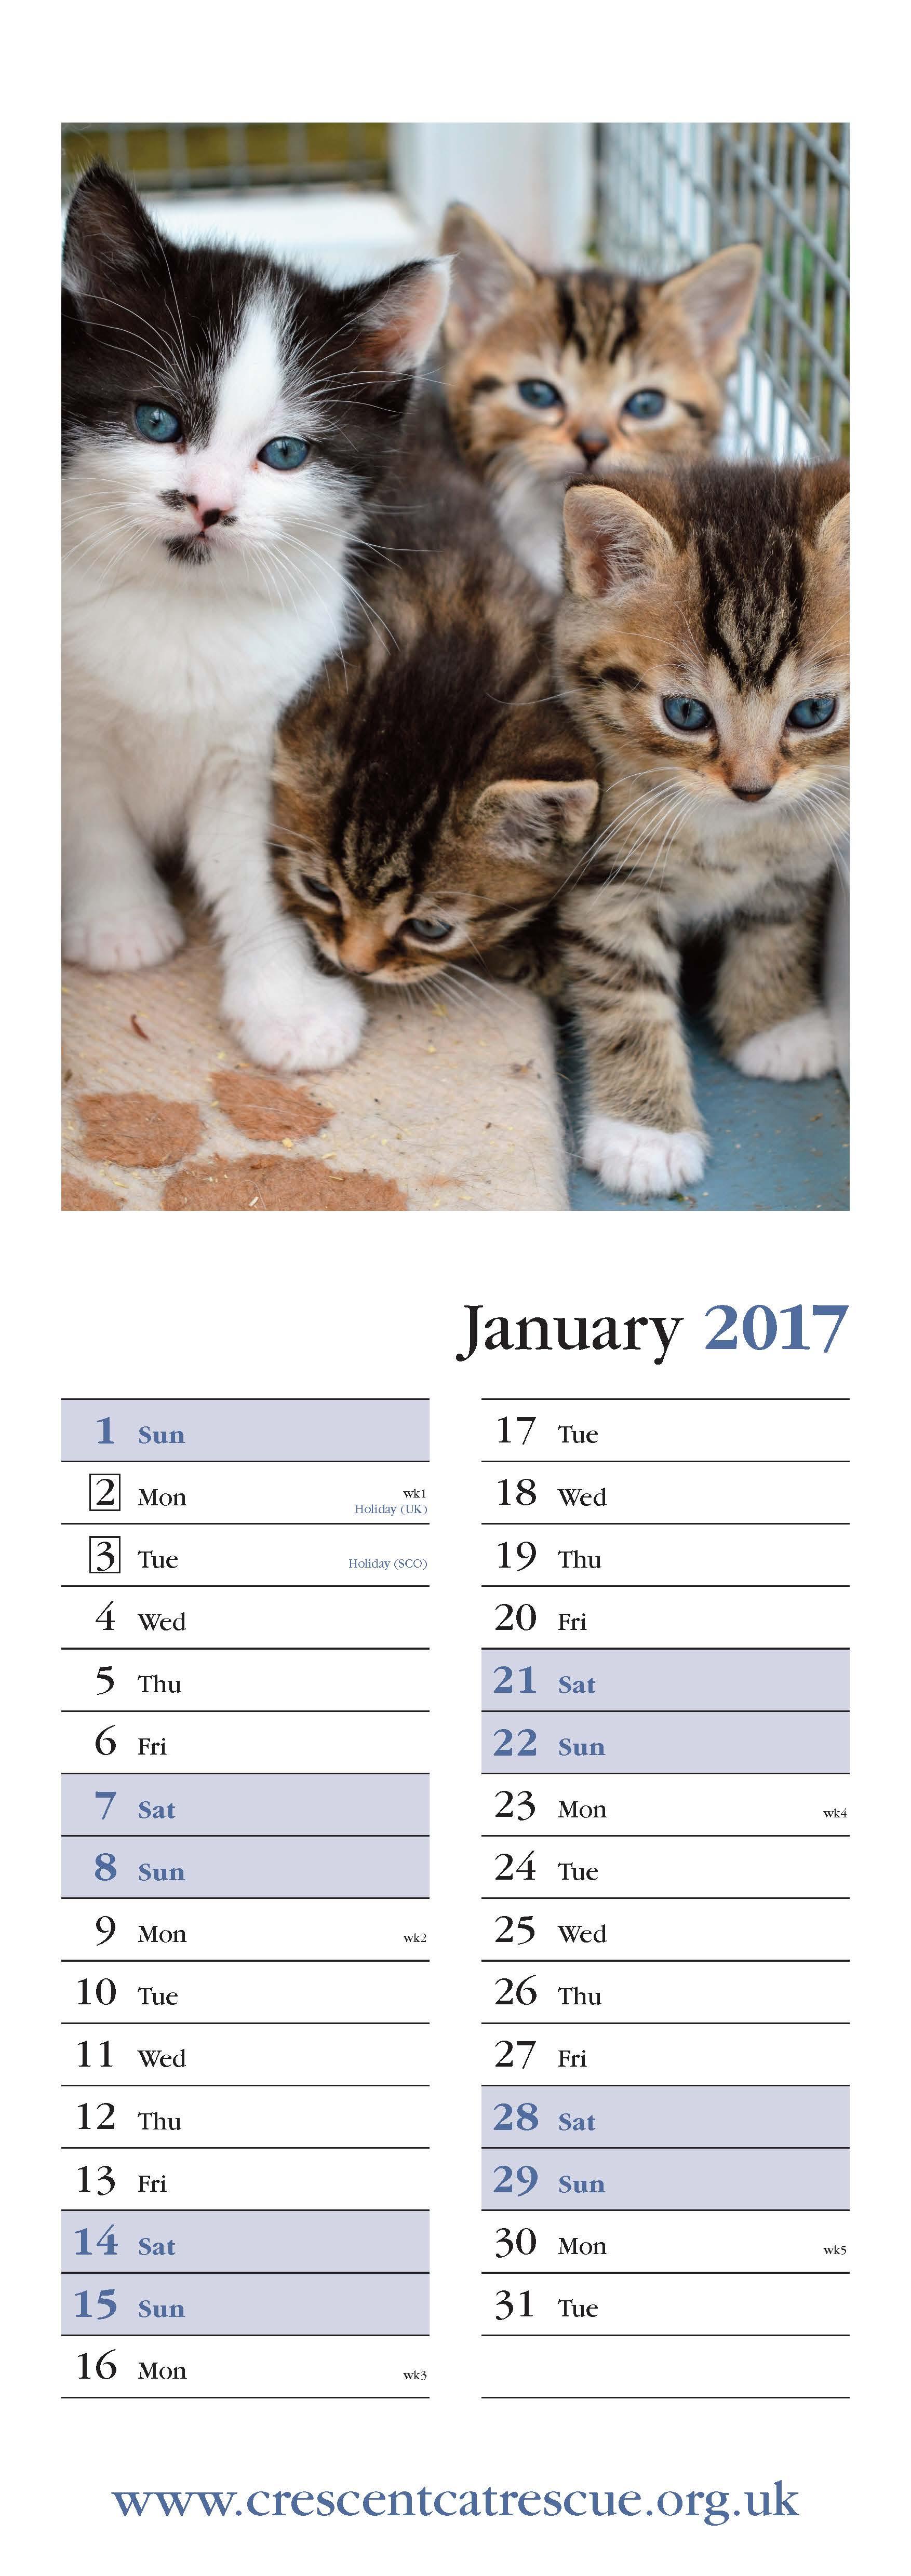 945_394 Crescent Cat Rescue W-S1 2.jpg